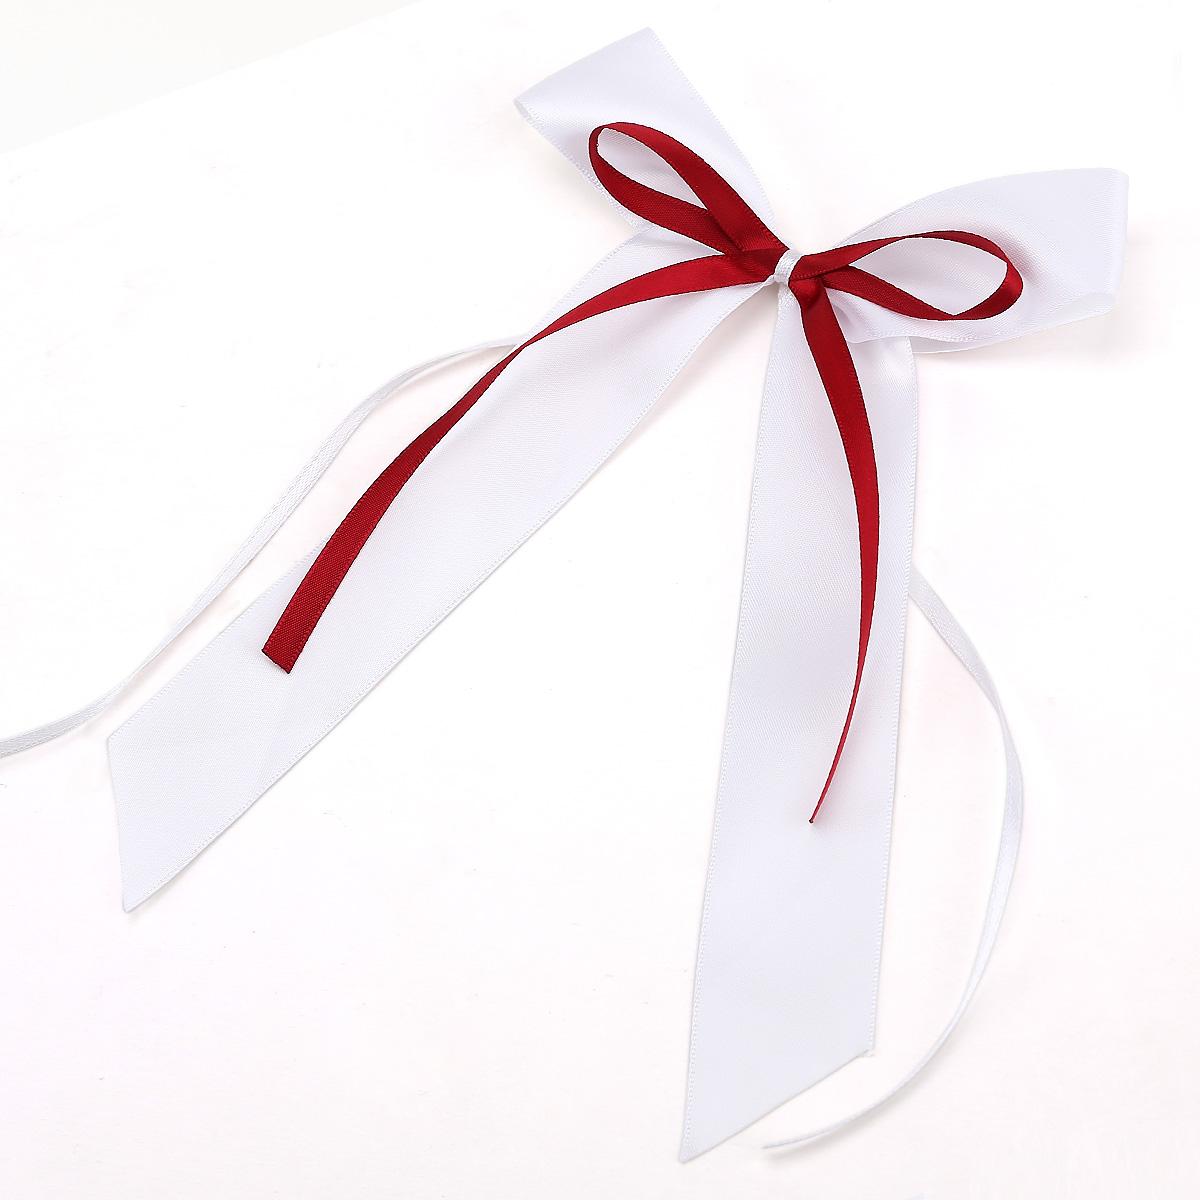 10pcs noeud papillon ruban satin d coration voiture salle. Black Bedroom Furniture Sets. Home Design Ideas